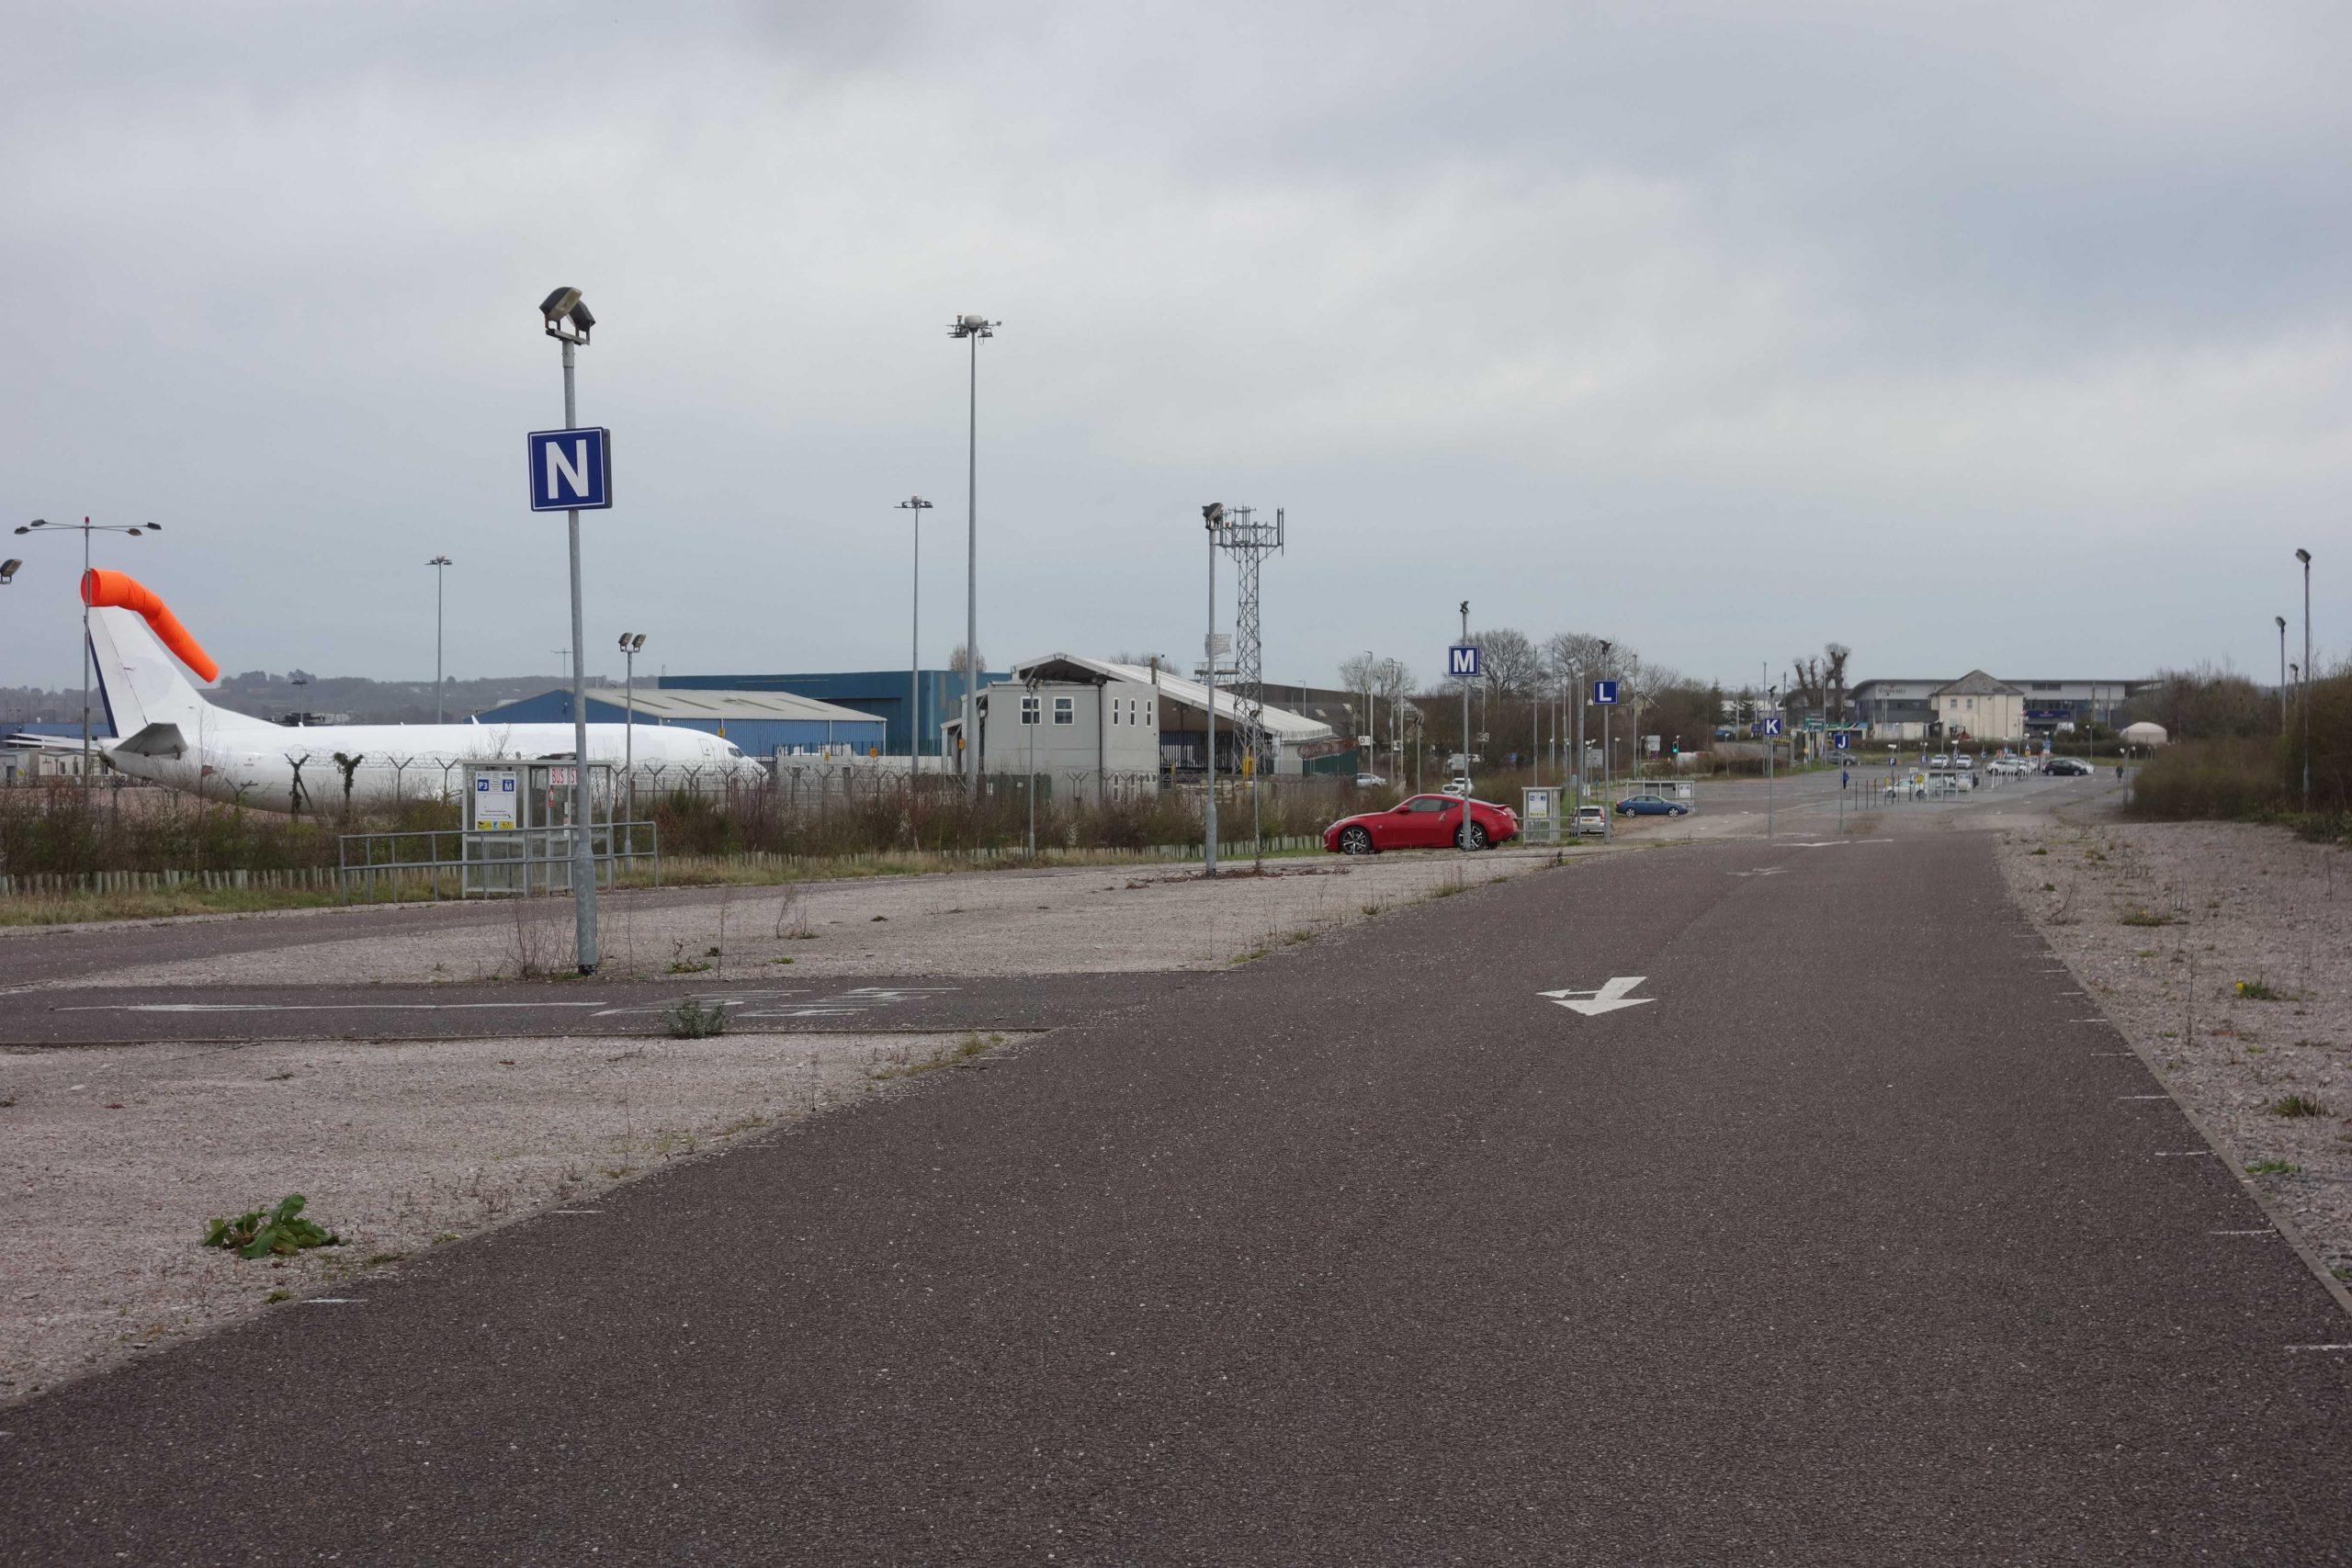 Exeter Airport car park